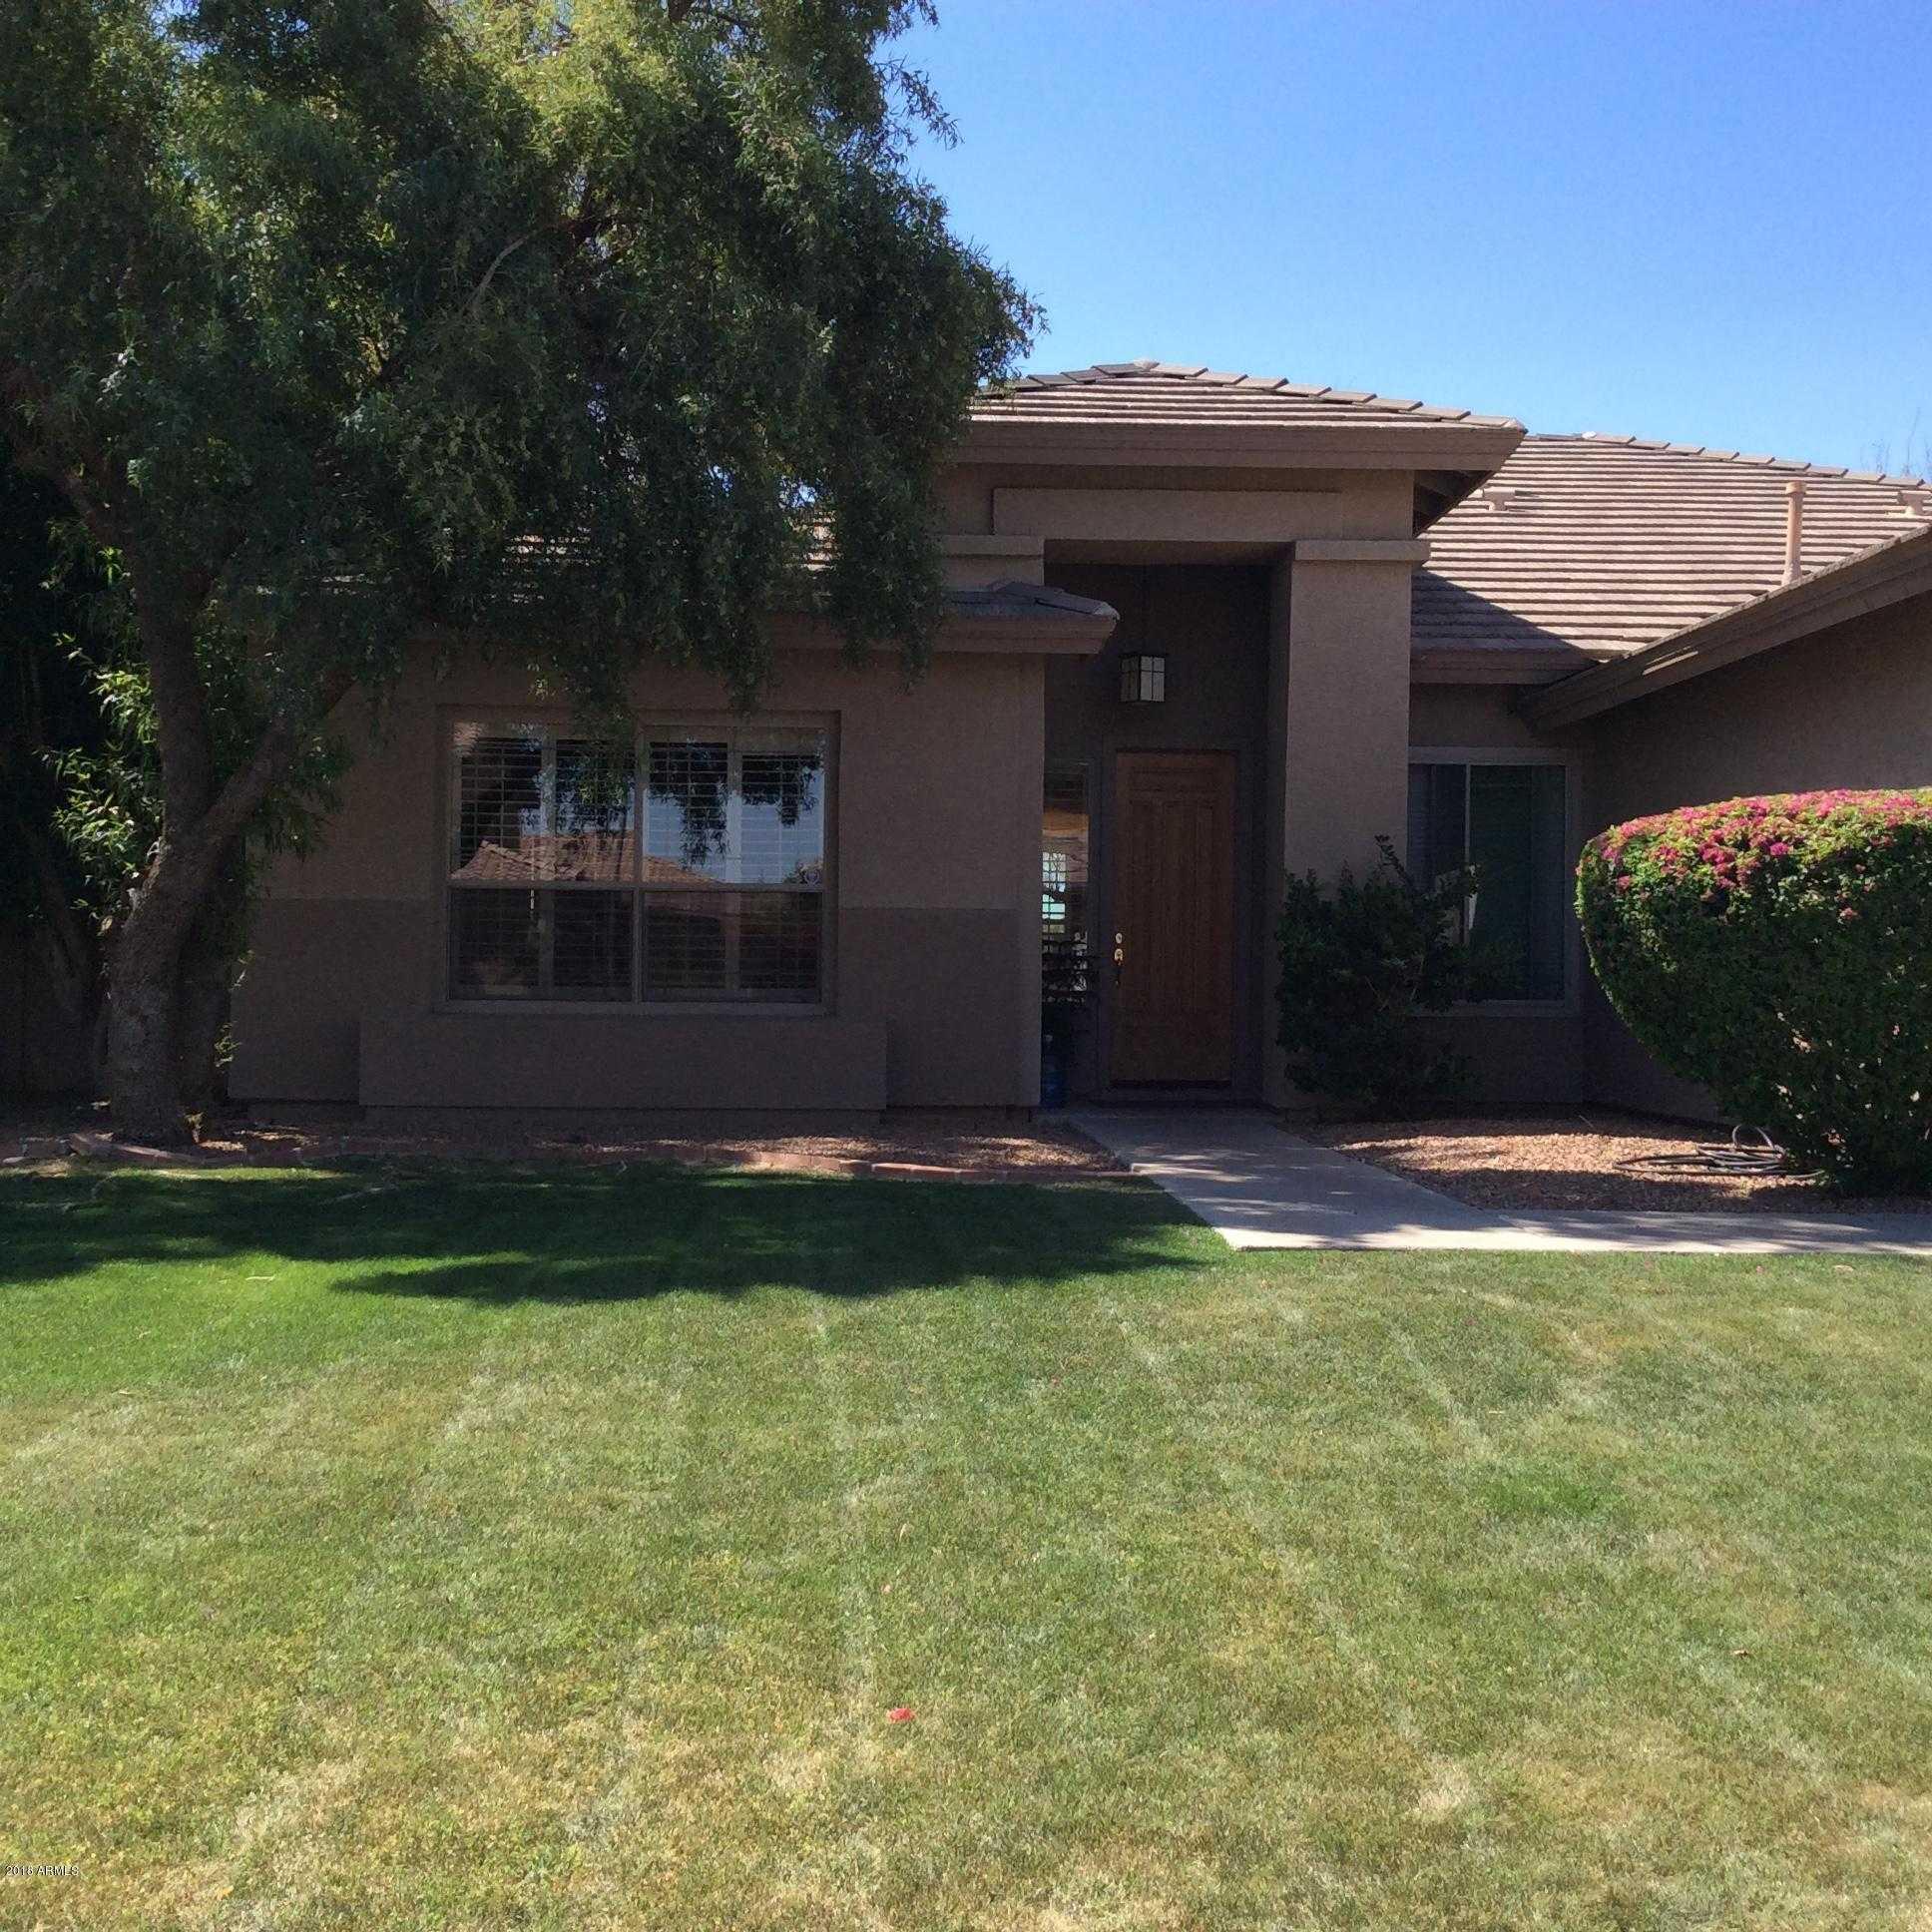 $389,900 - 4Br/2Ba - Home for Sale in Coppercrest, Glendale